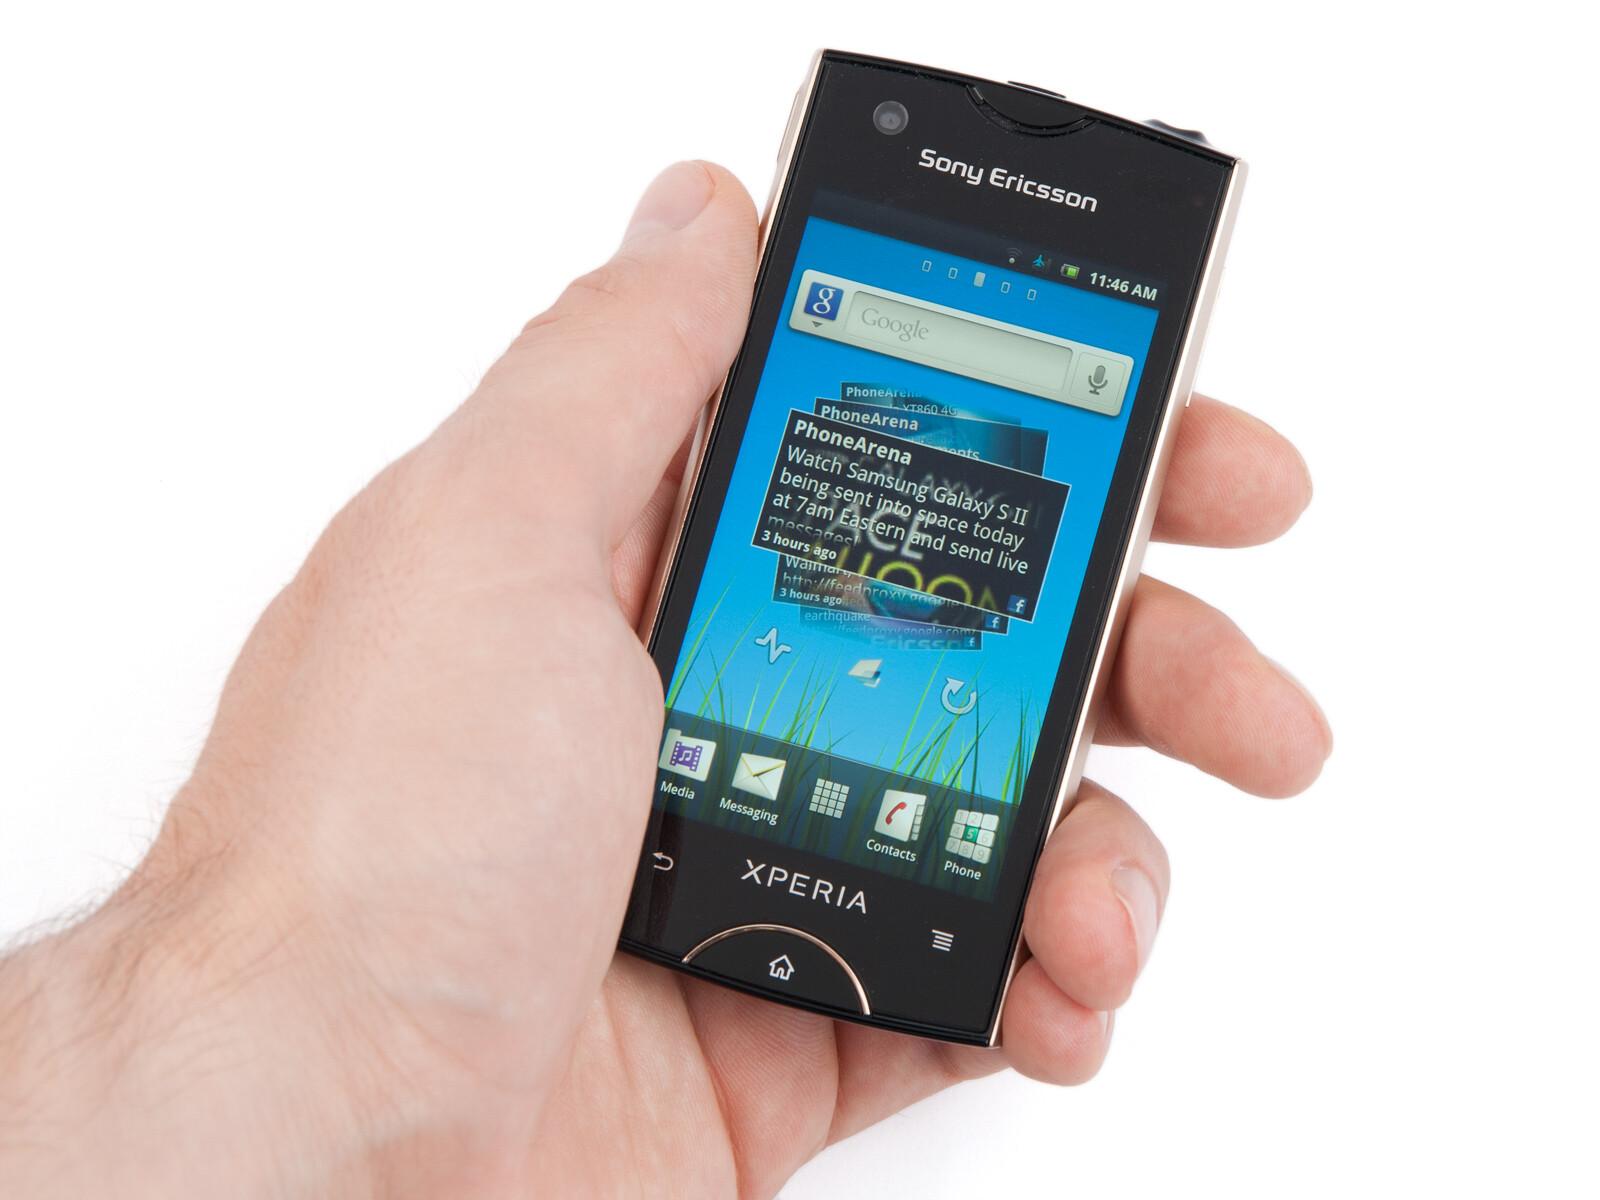 sony ericsson xperia ray photos rh phonearena com Sony Ericsson Xperia Ion Sony Ericsson Xperia X8